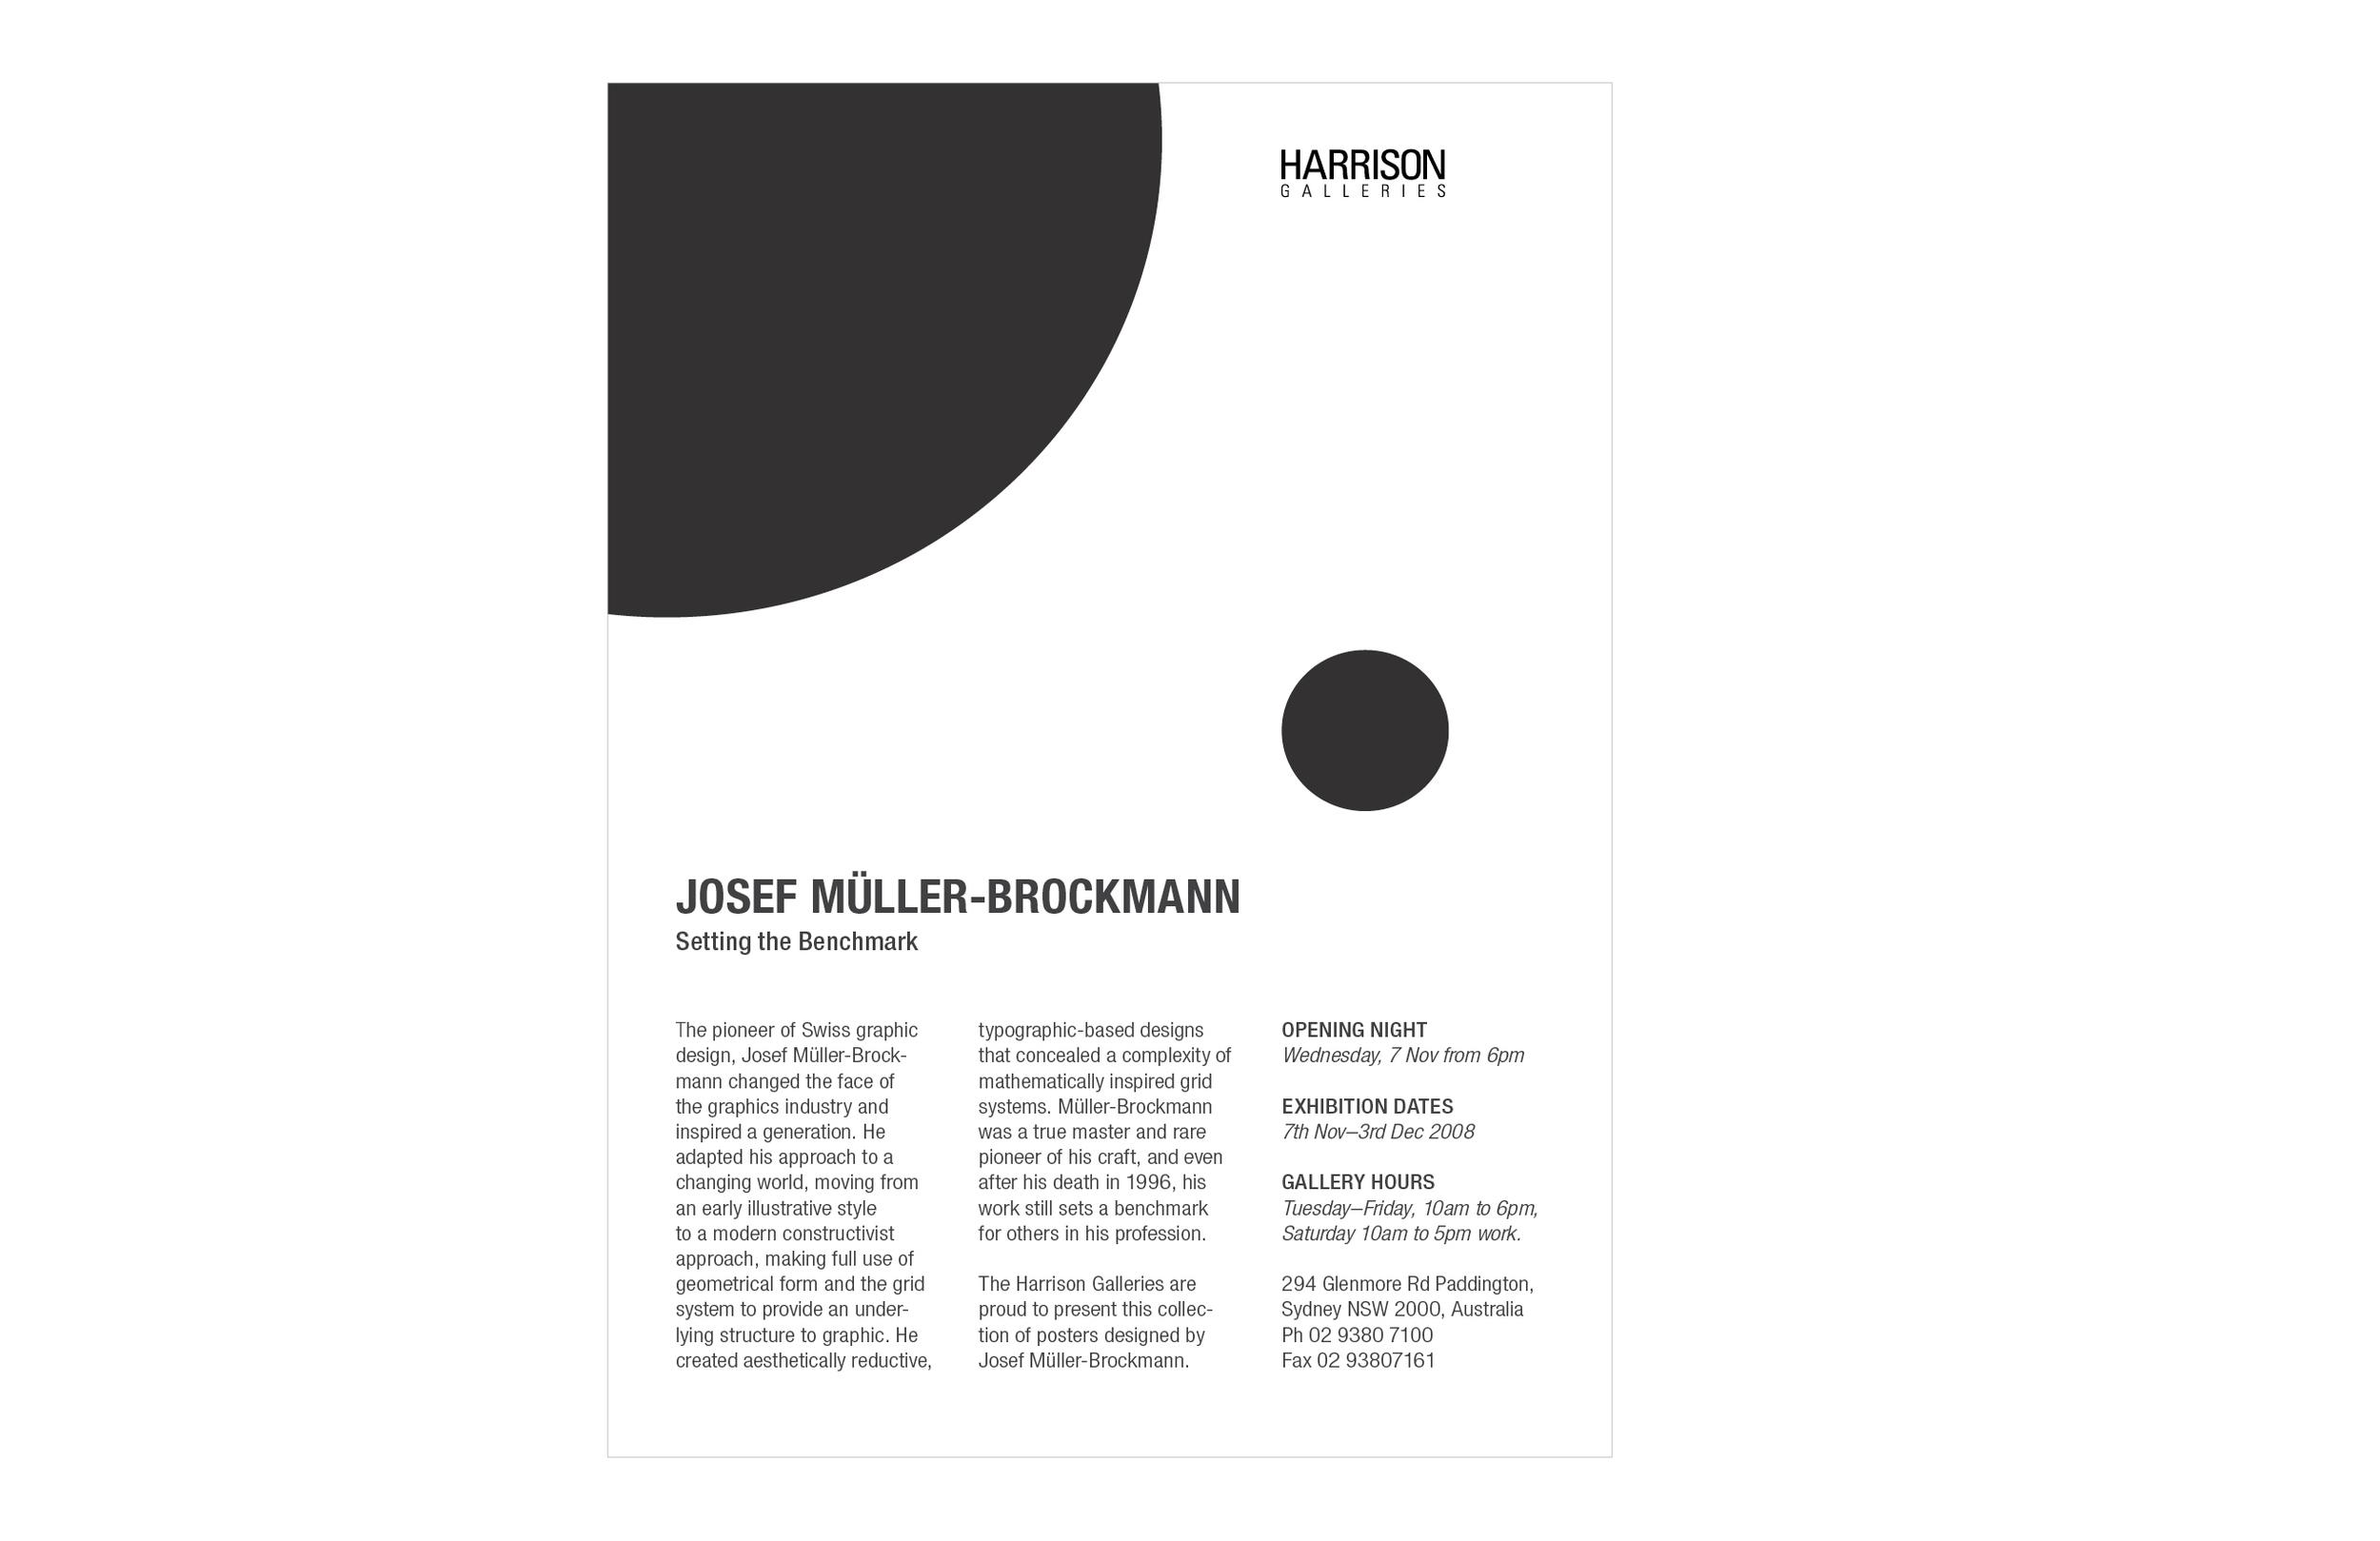 Joseph Müller-Brockman Exhibit Invitation